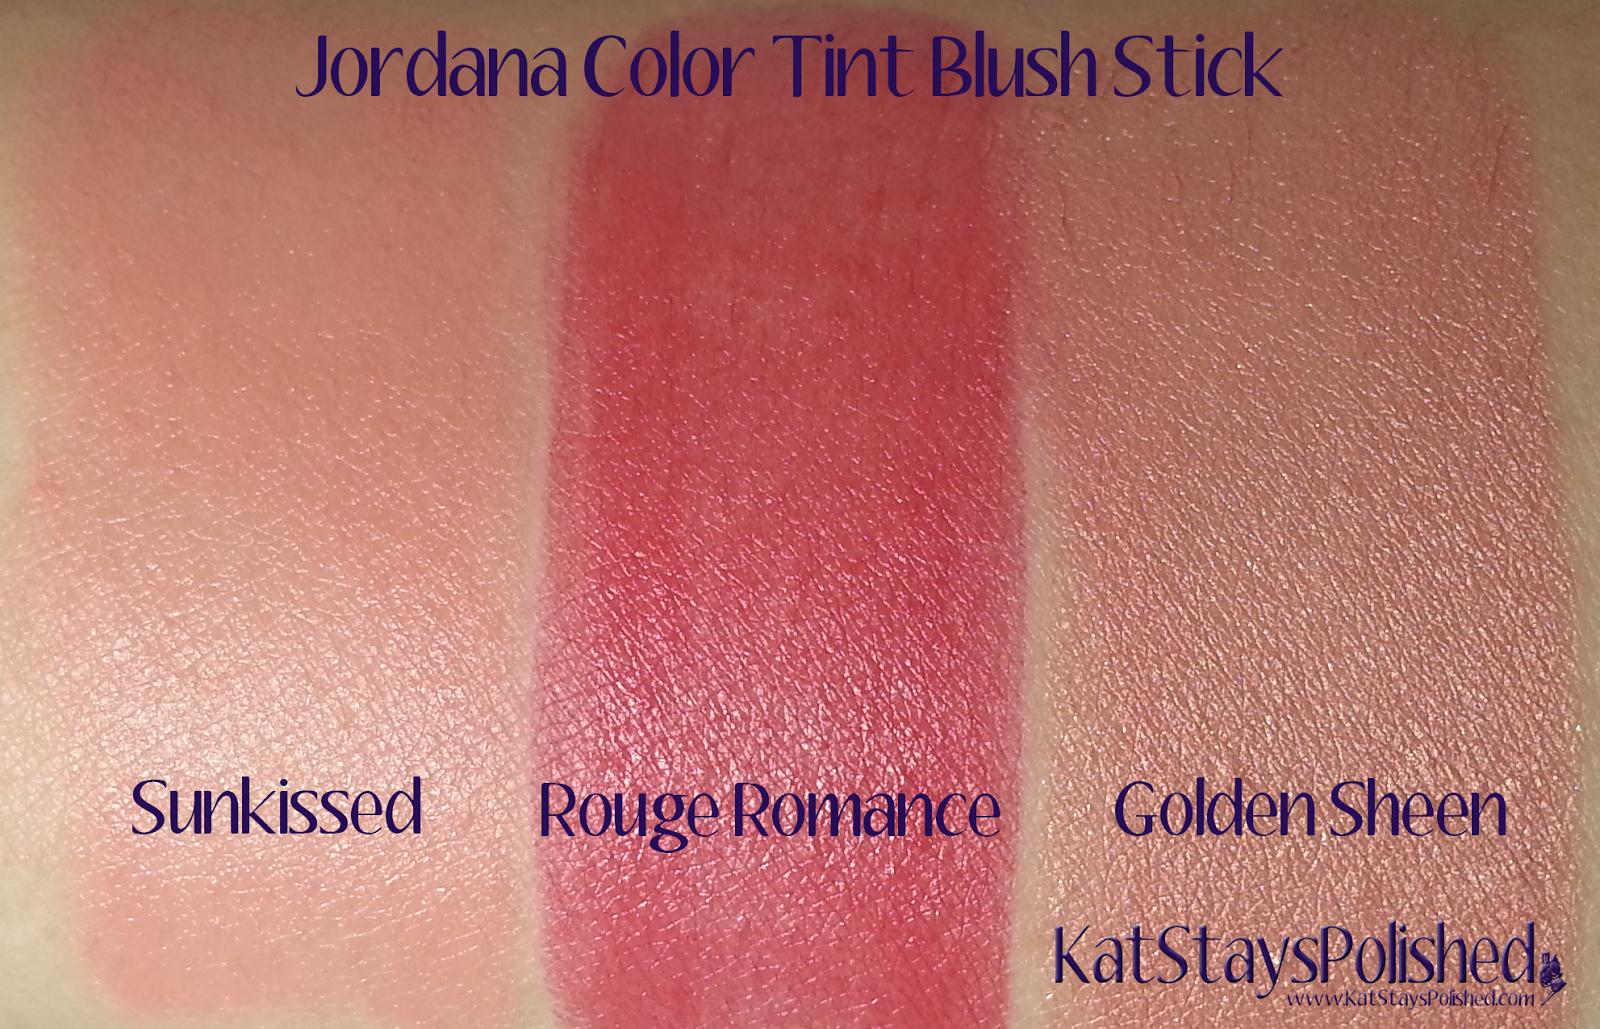 Jordana Color Tint Blush Stick | Kat Stays Polished